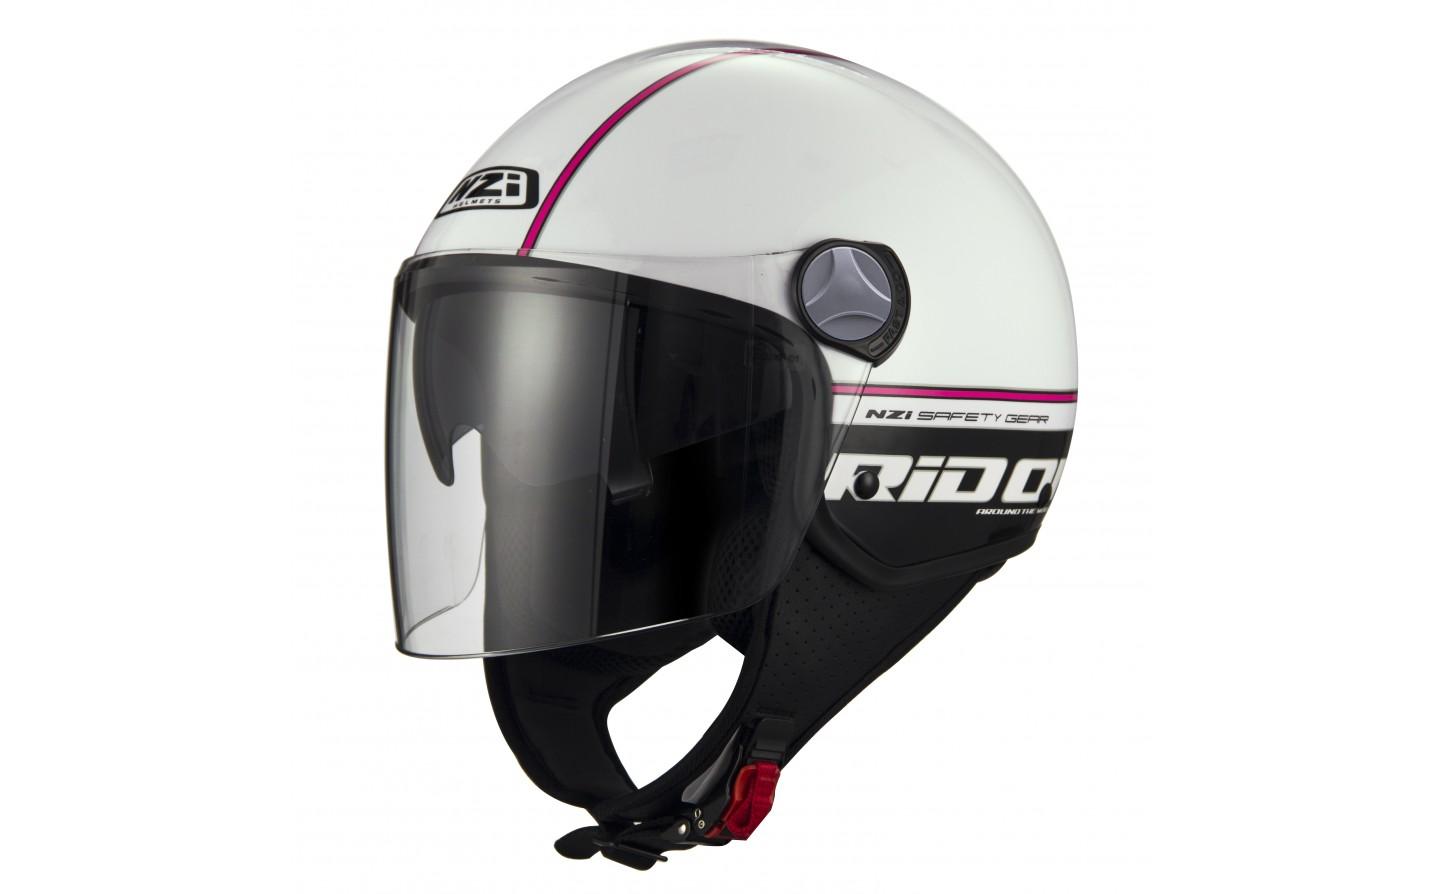 Cascos › Jet Casco Moto Jet NZI Capital 2 Duo blanconegro L